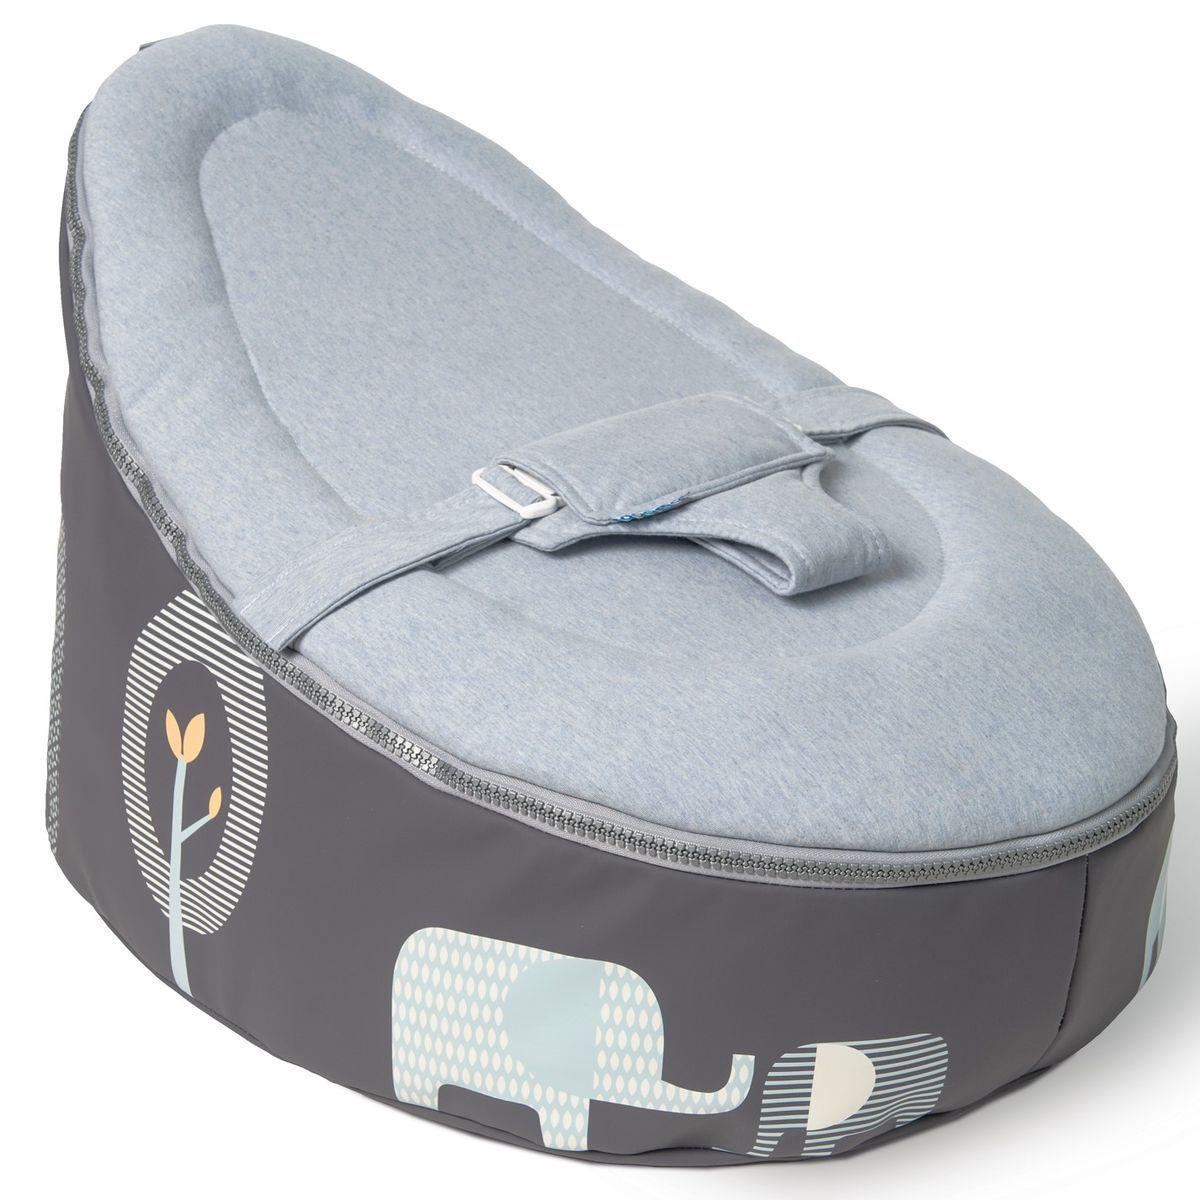 Pouf-relax SEAT Doomoo elephant-blue